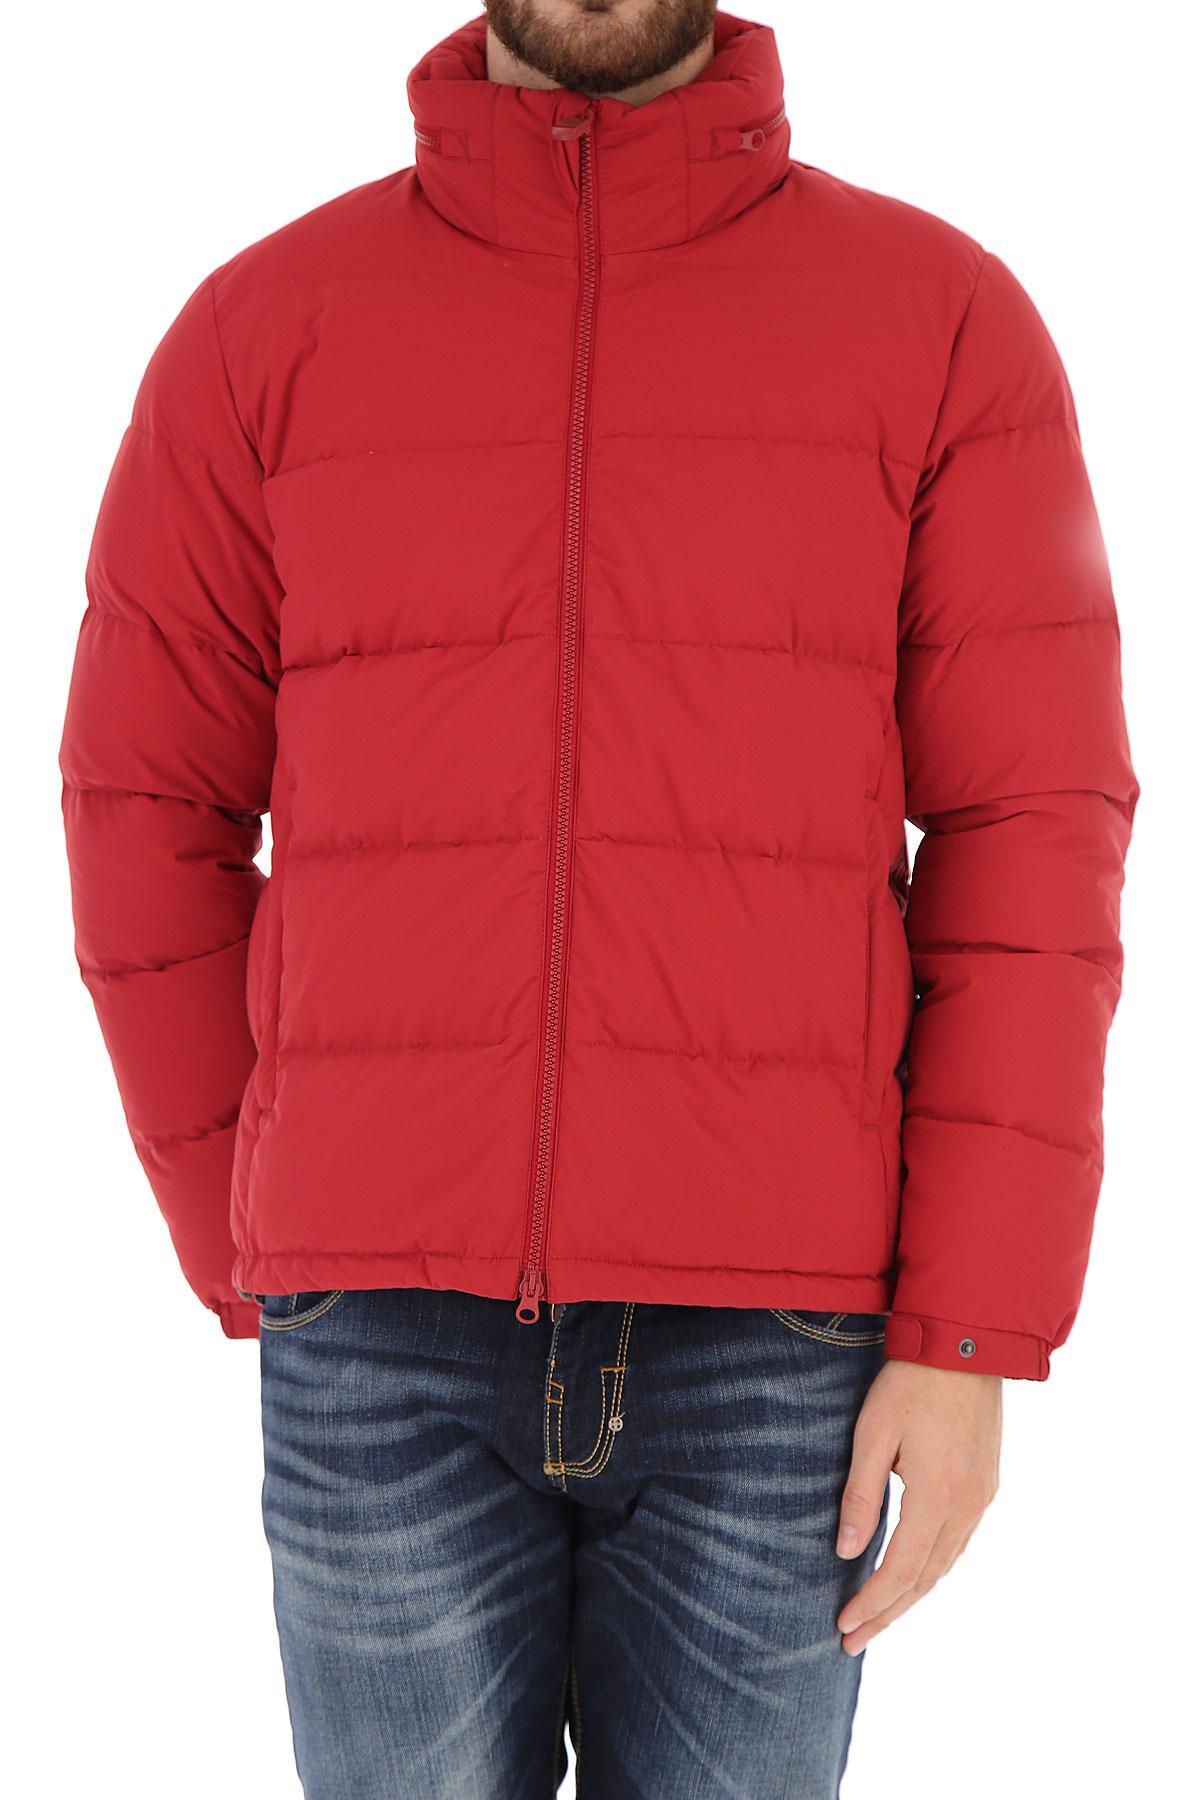 1d4be532732 aspesi-Red-Down-Jacket-For-Men.jpeg